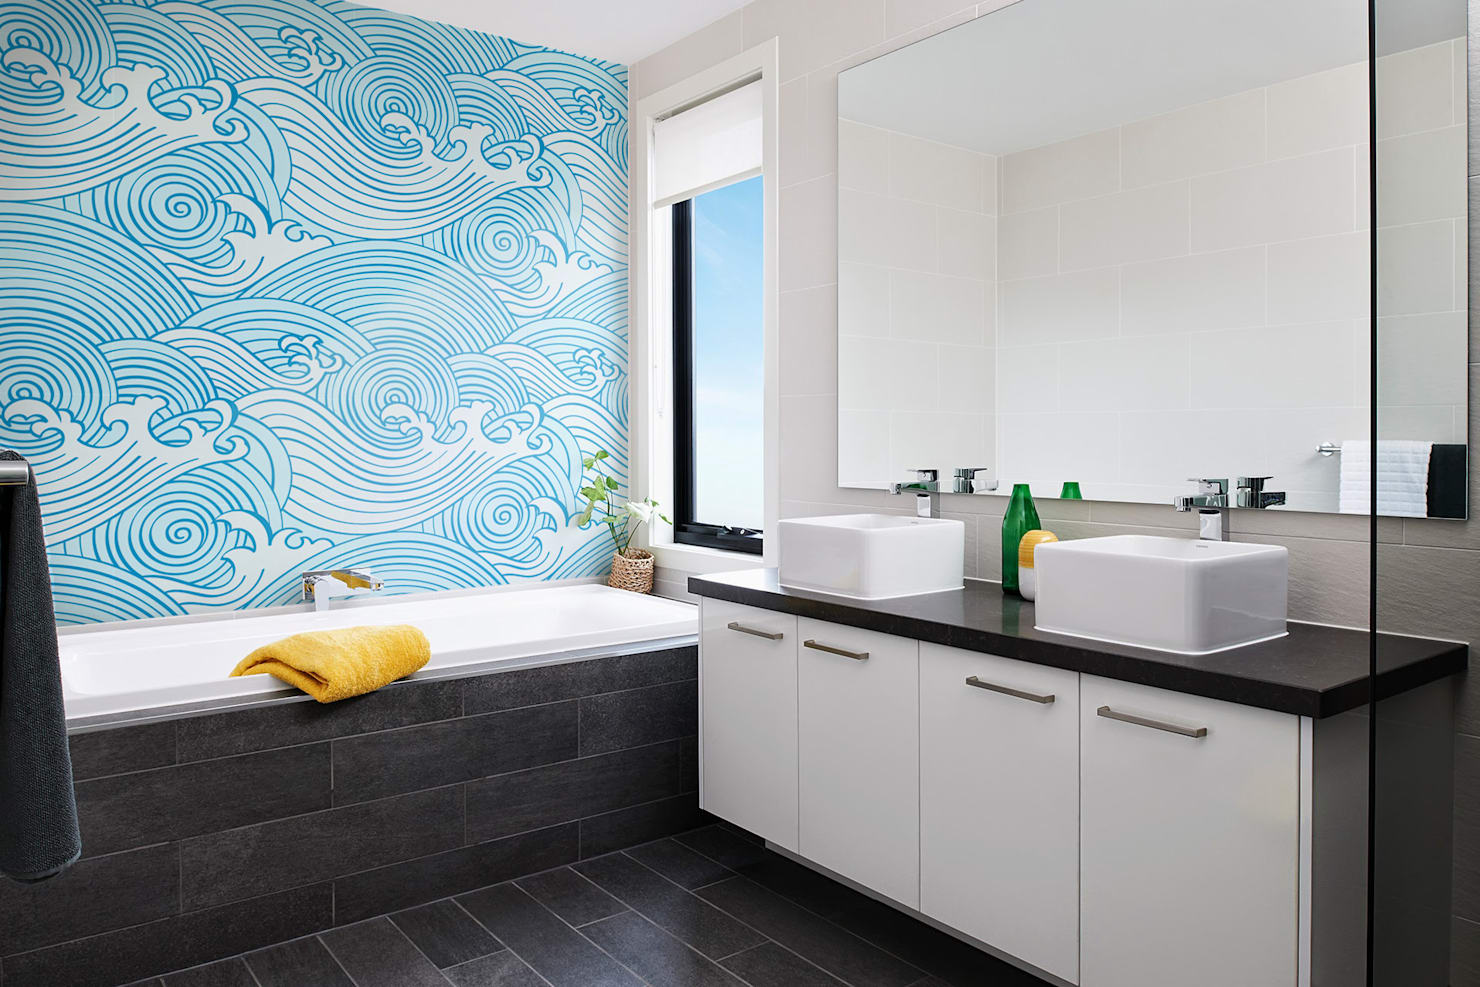 Genius organisation ideas to save your small bathroom